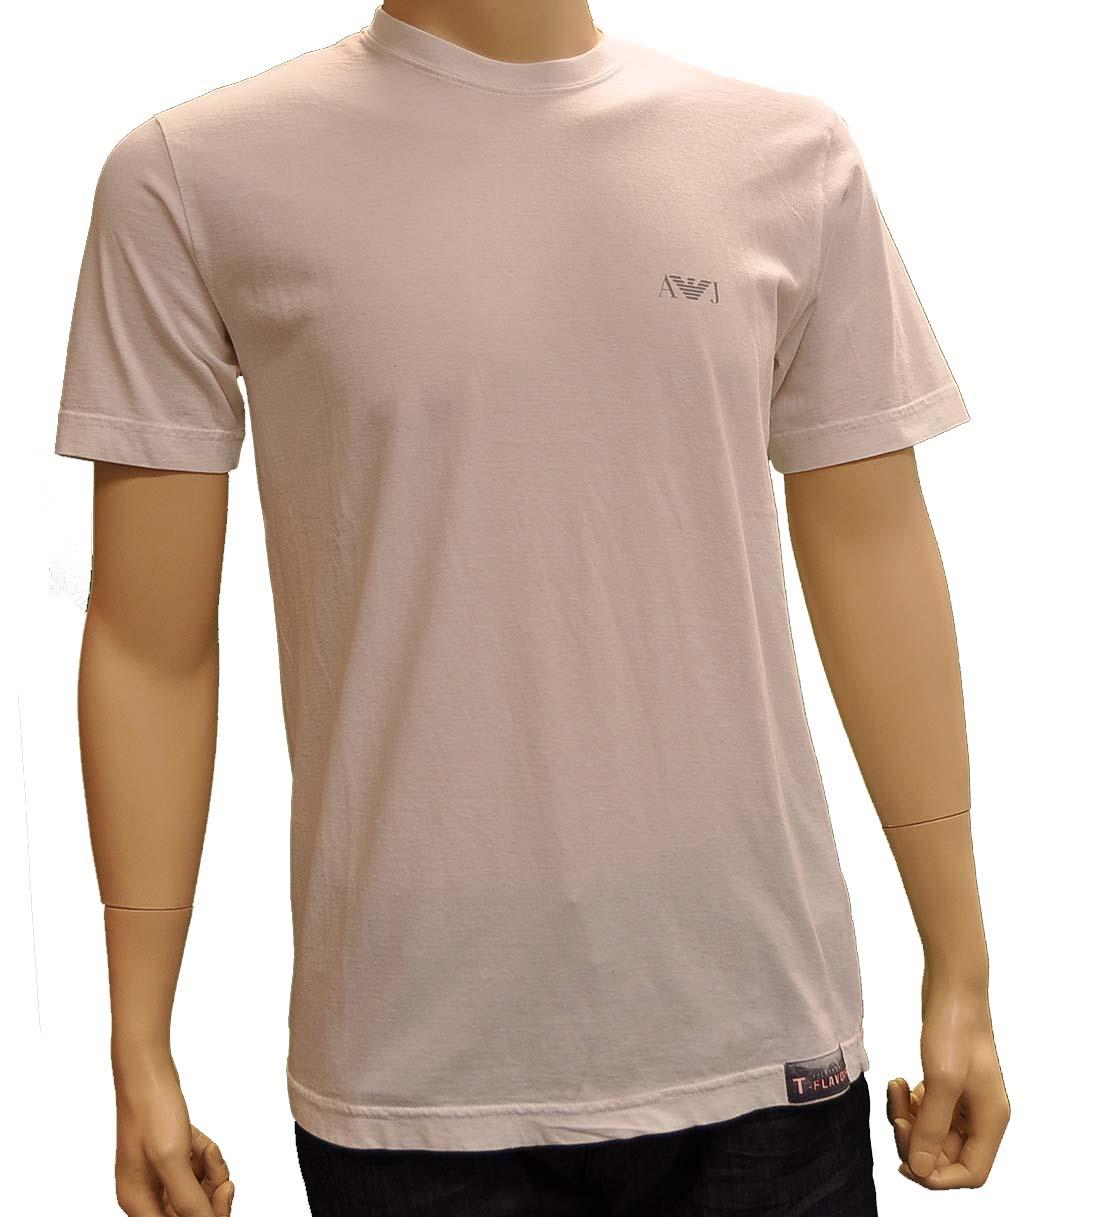 Armani Jeans White Cotton TShirt